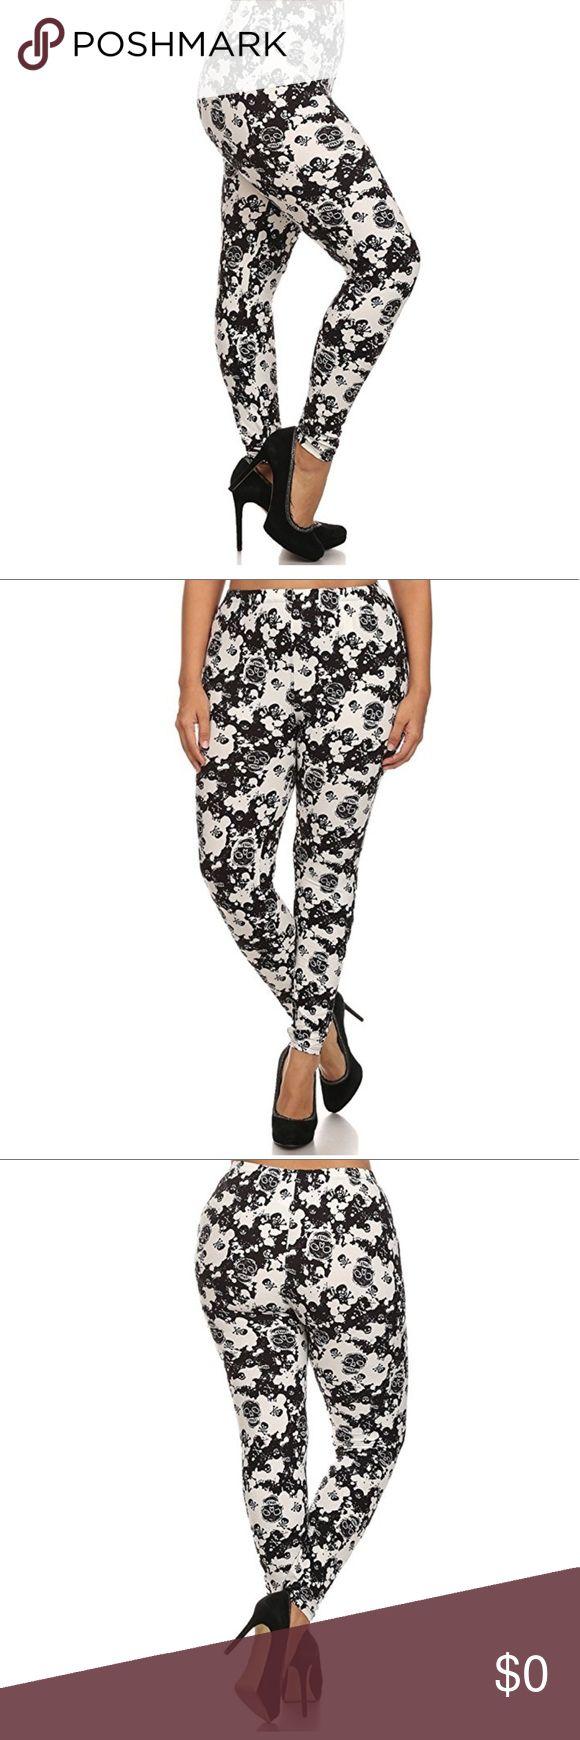 Plus Size Leggings Plus Size Black & White Skull Pattern Leggings. 92% Polyester, 5% Spandex Pants Leggings